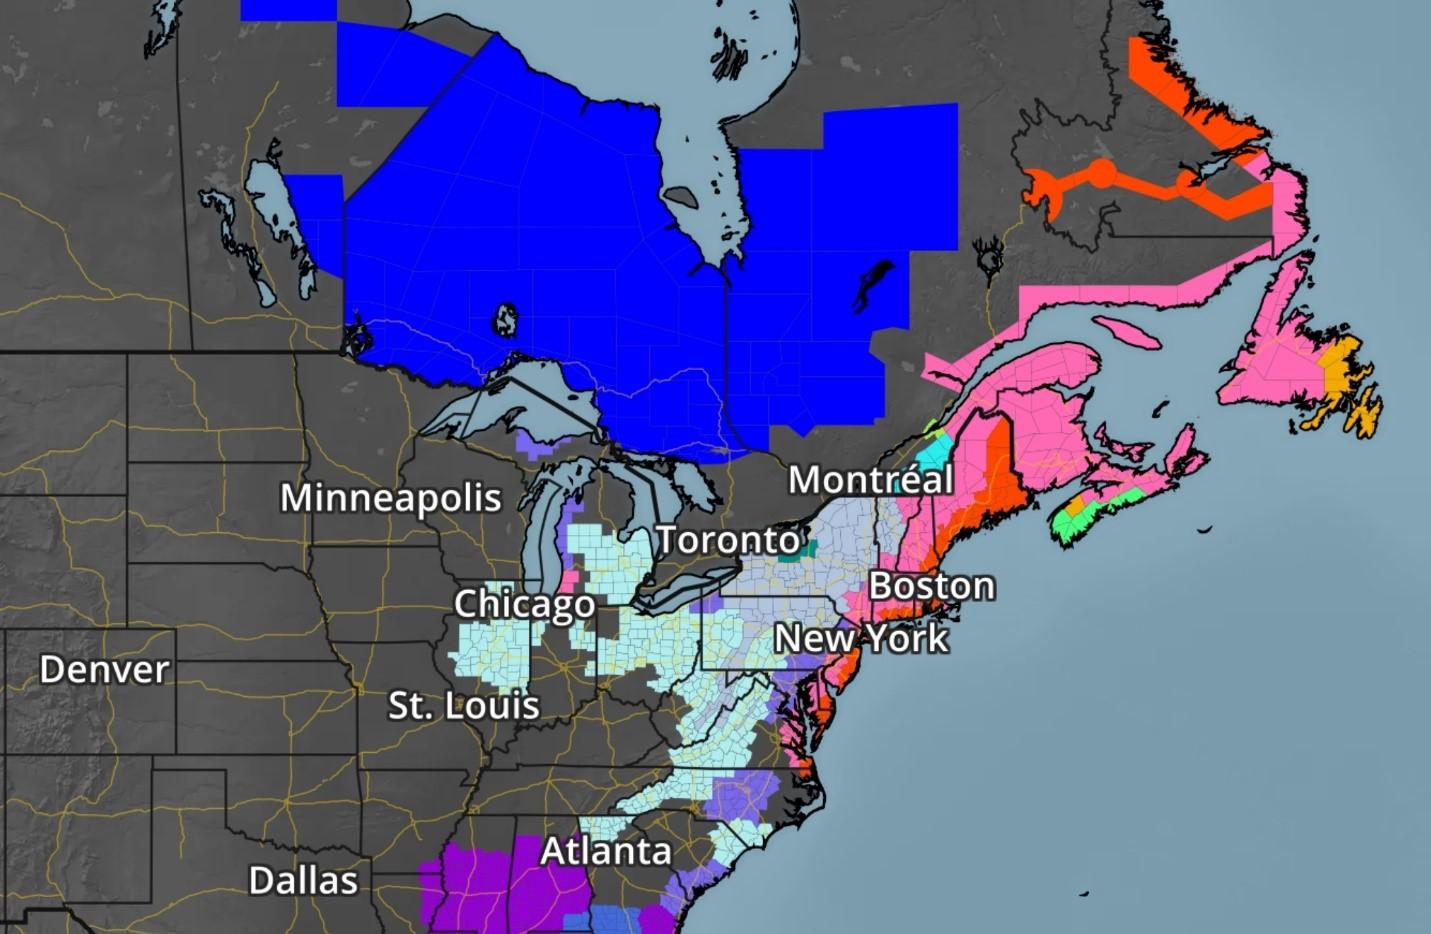 Radar Image of Norther East Coast